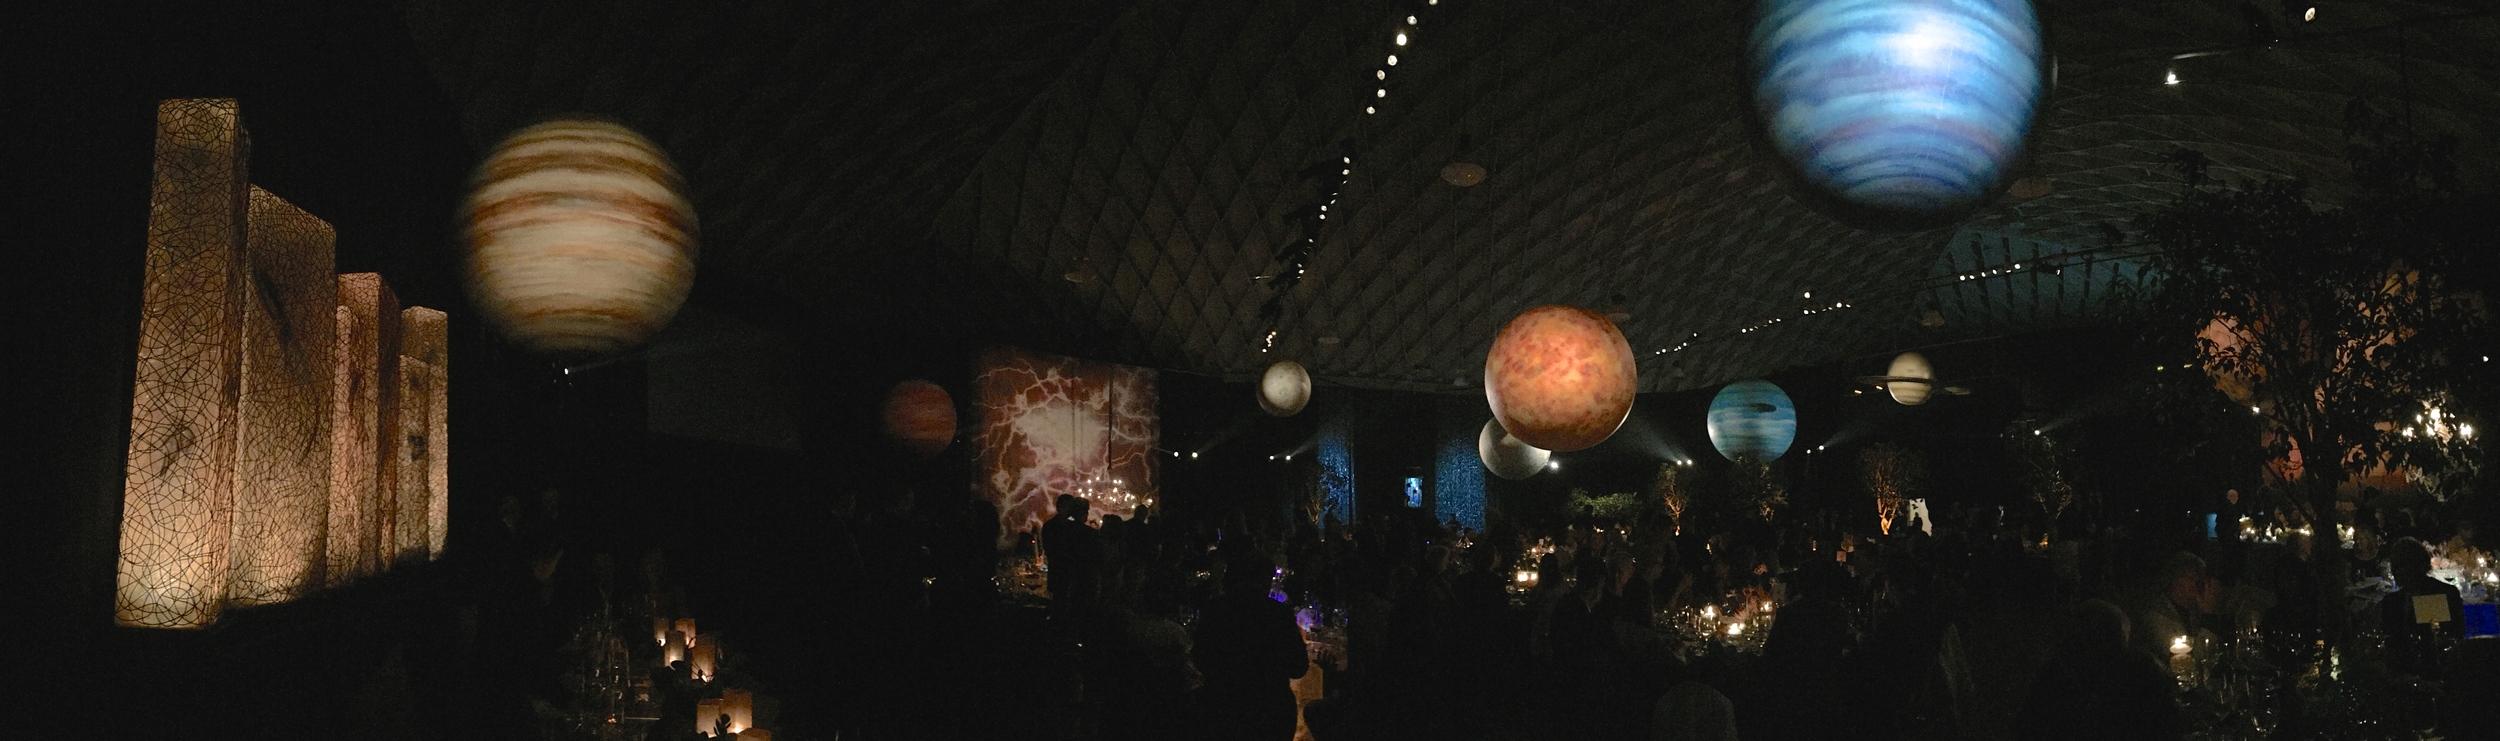 Planets by Matthew McAvene Santa Barbara Museum of Natural History 100 year Anniversary Party .JPG